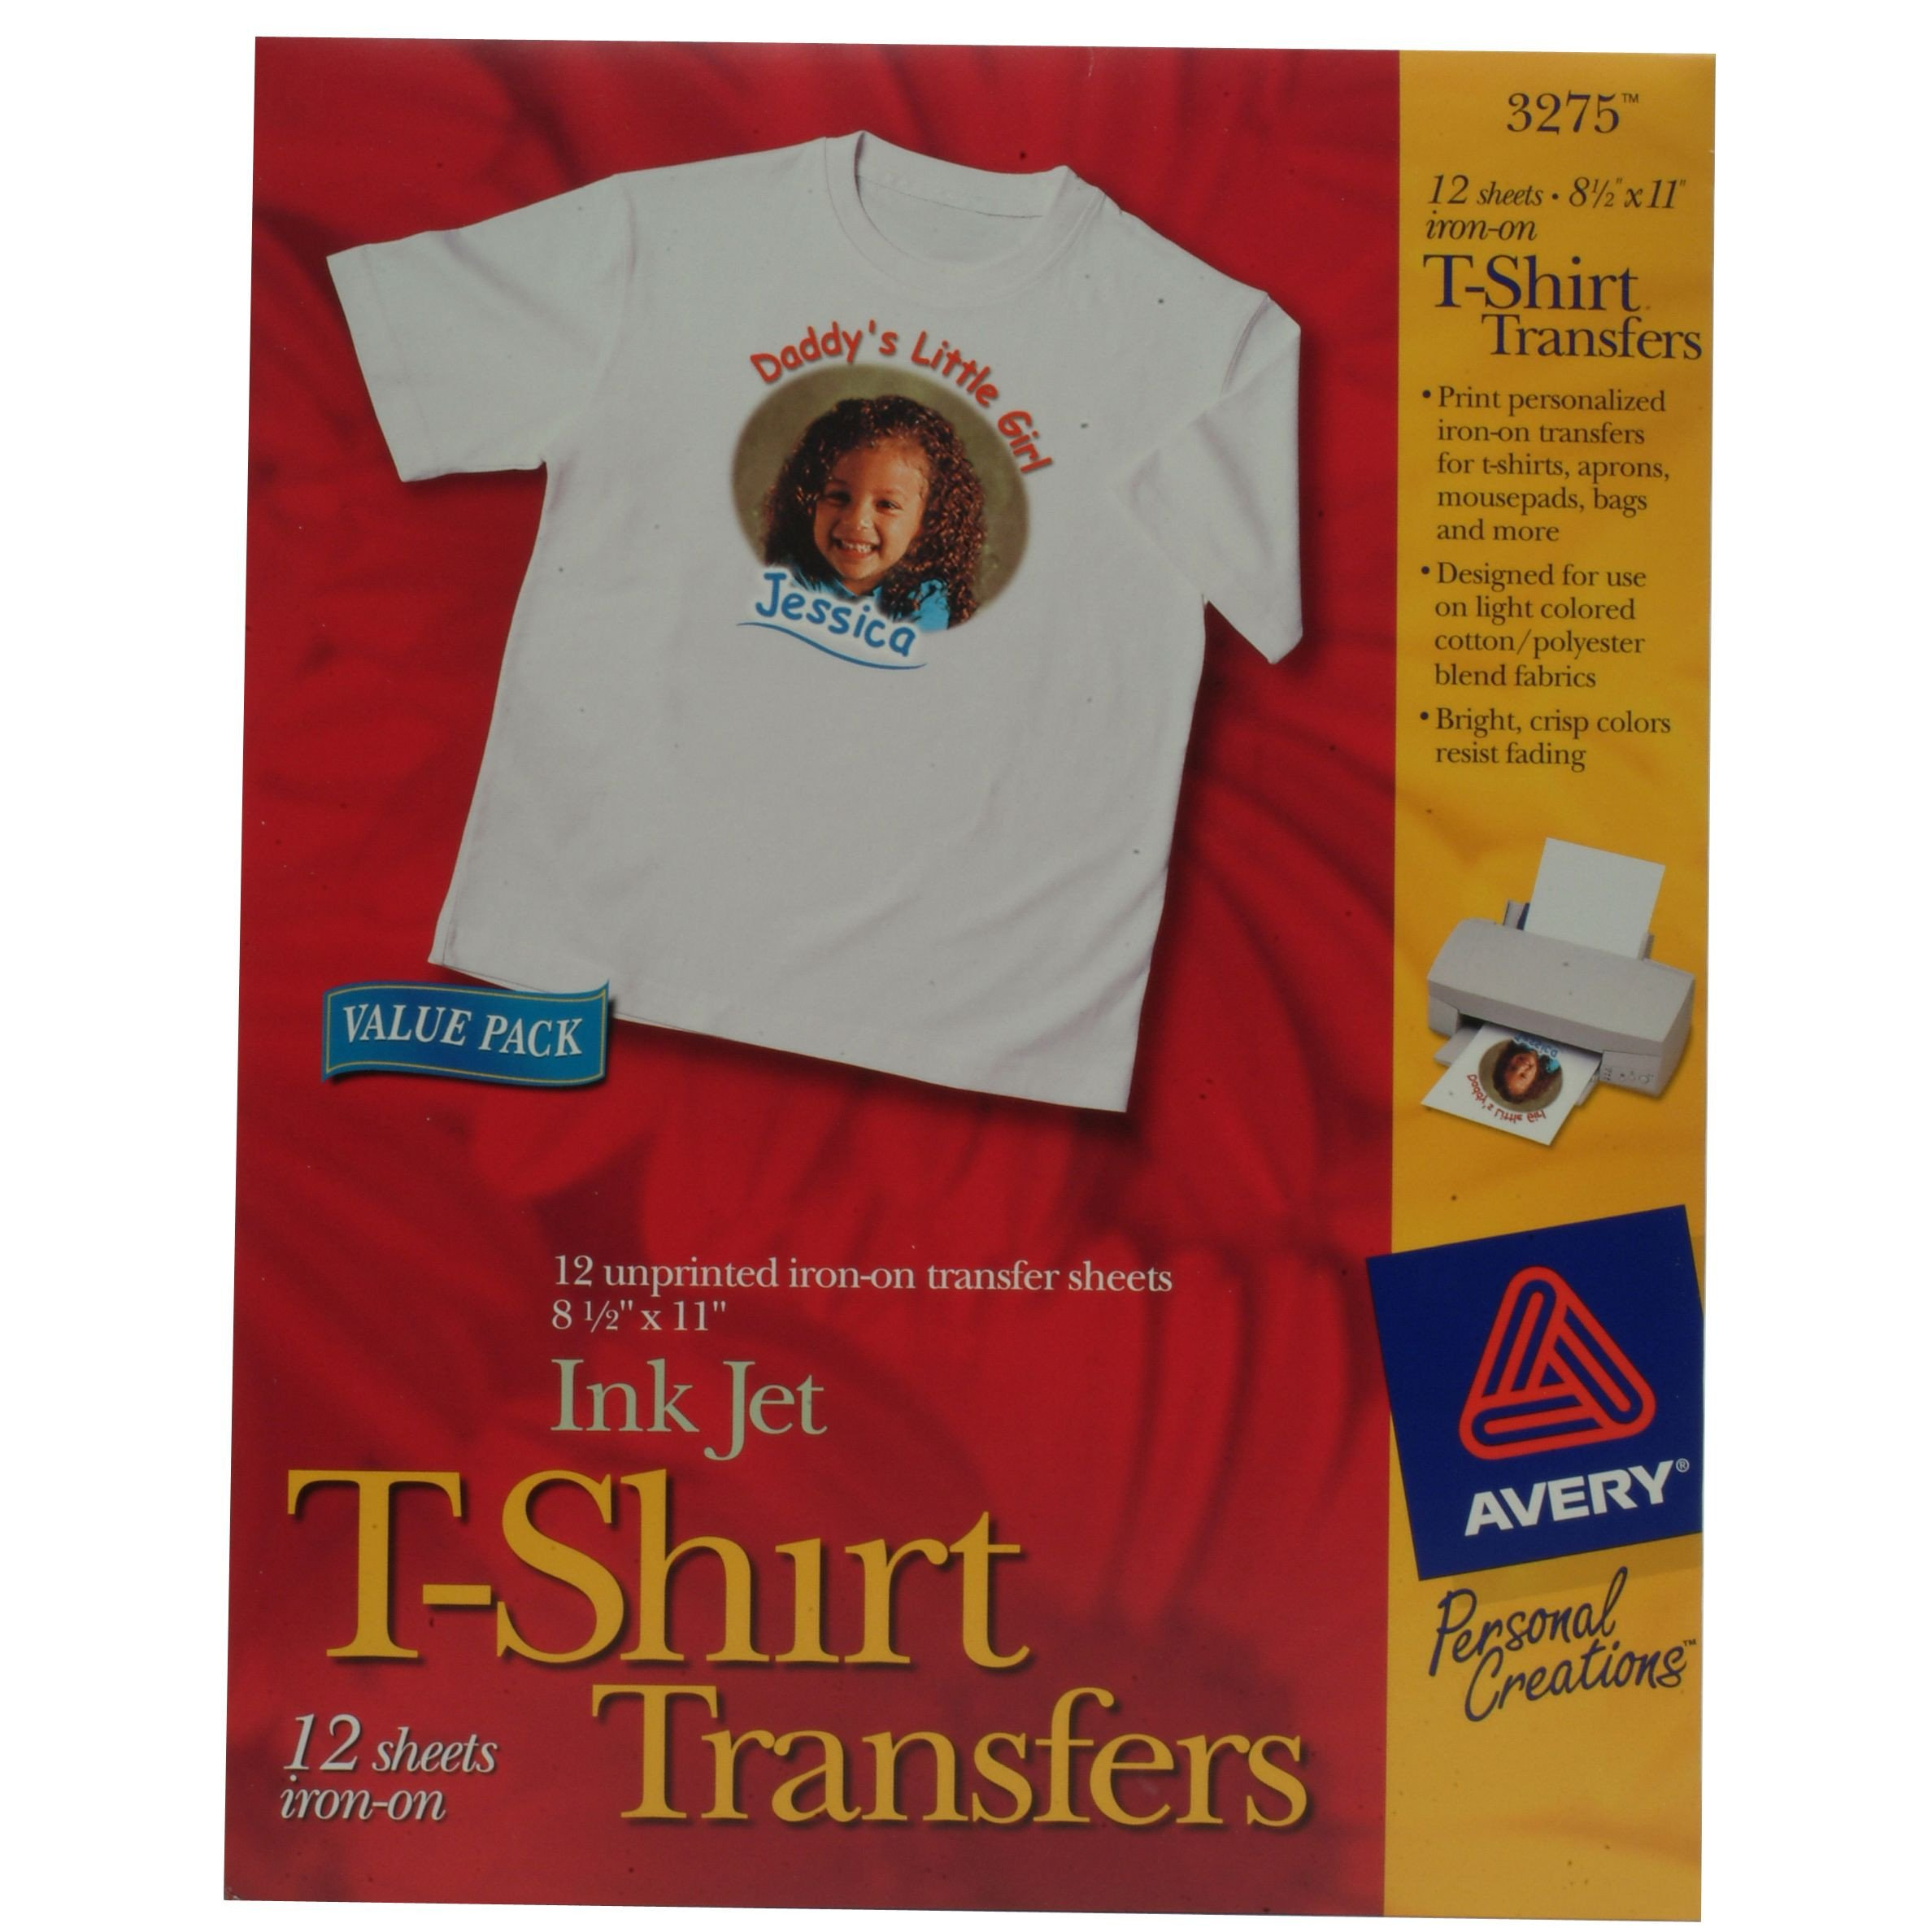 Avery T Shirt Template Avery T Shirt Transfers Inkjet 12 Sheet